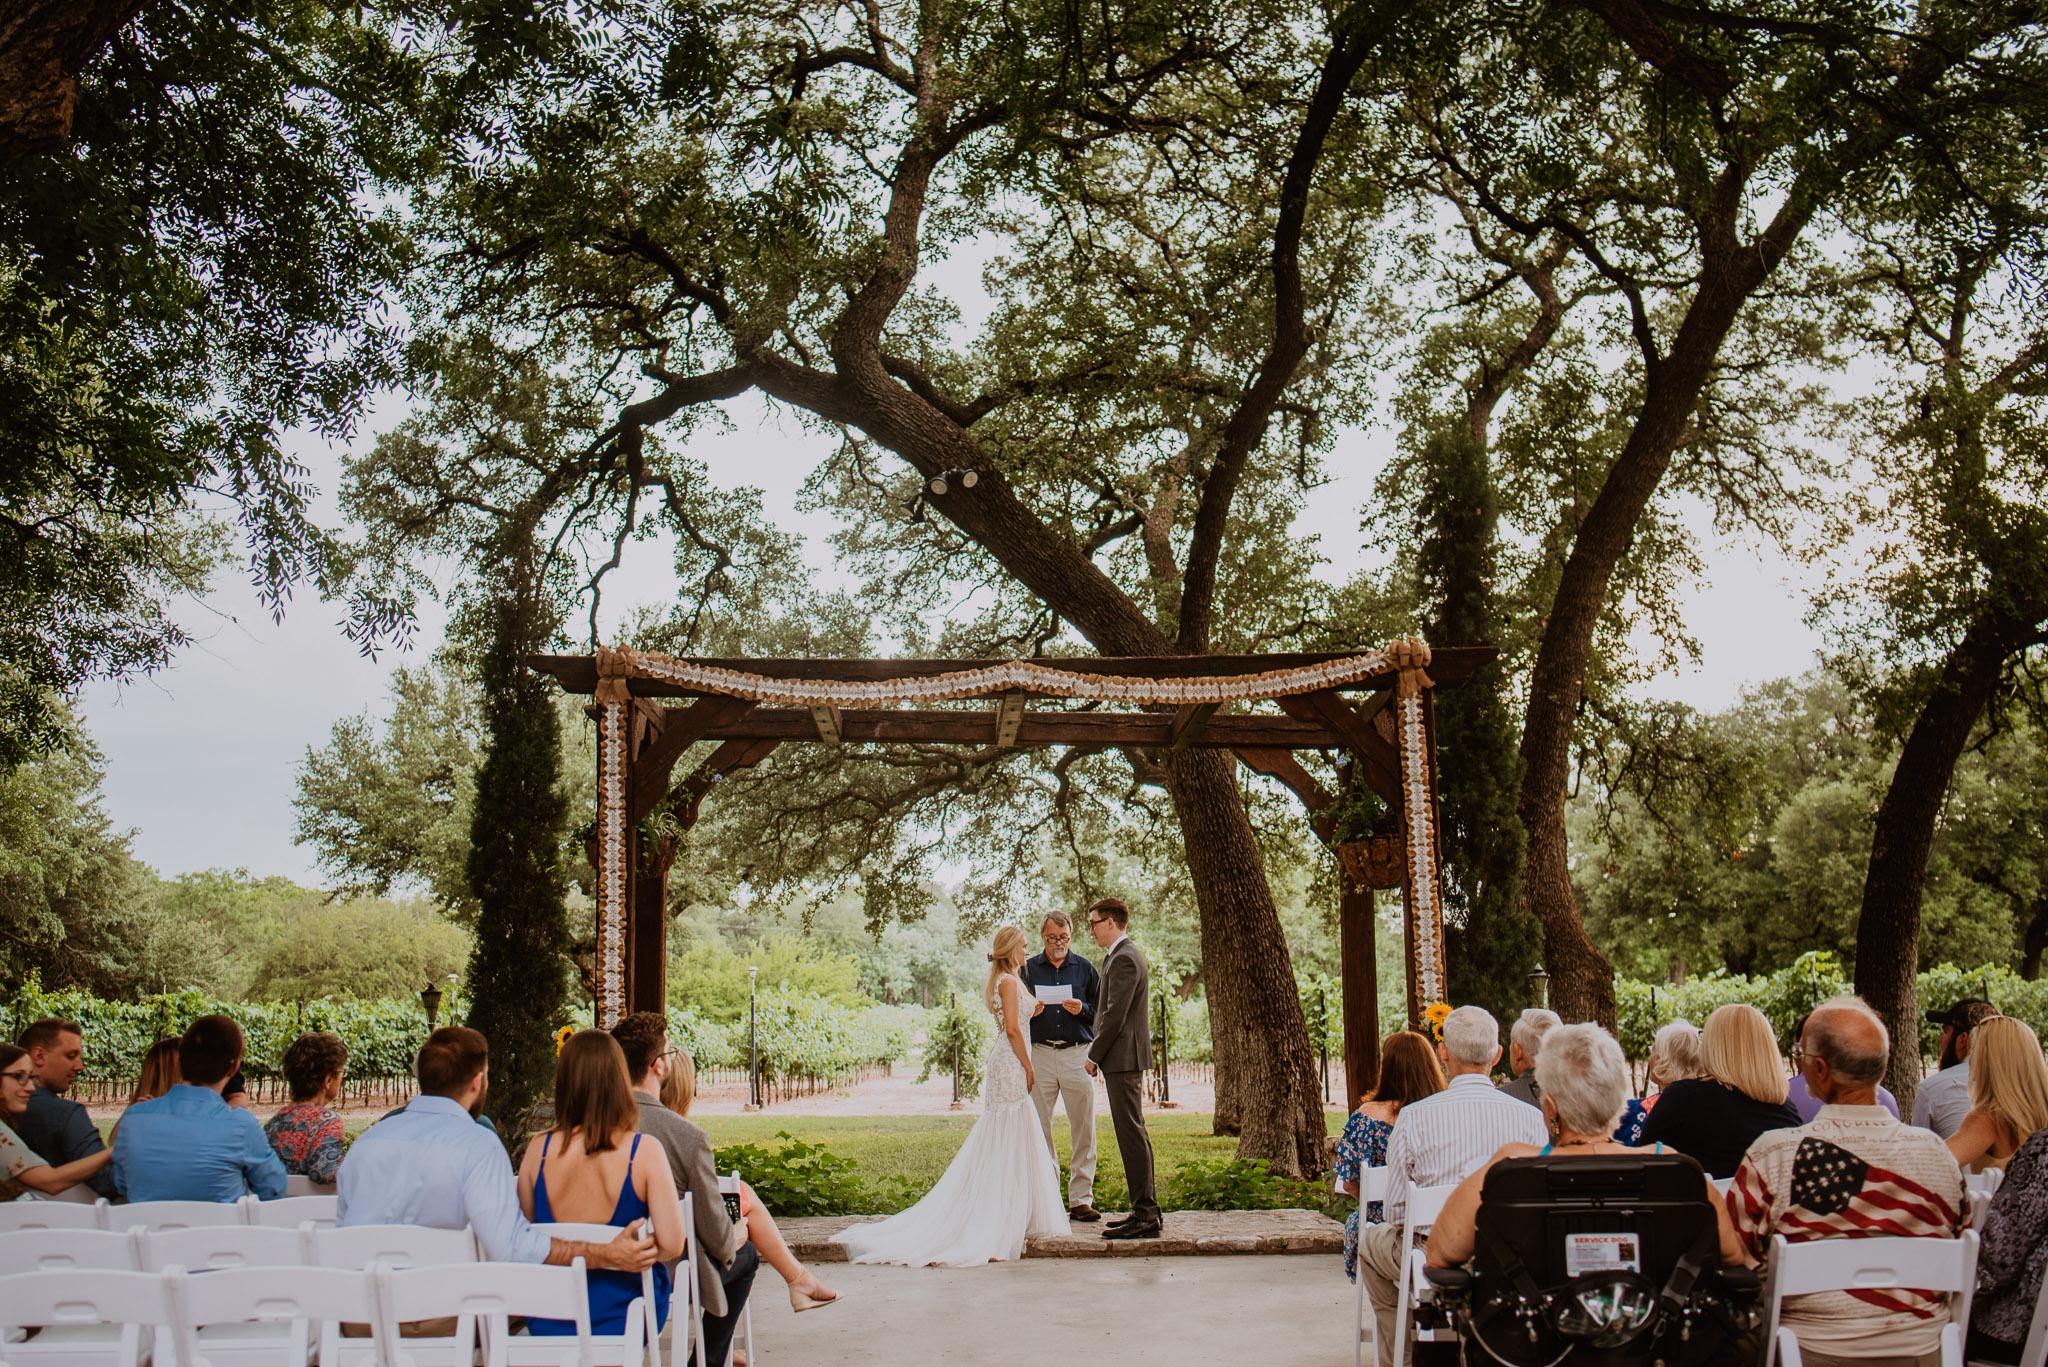 Christoval-vineyard-wedding-heather-justin-0019.jpg